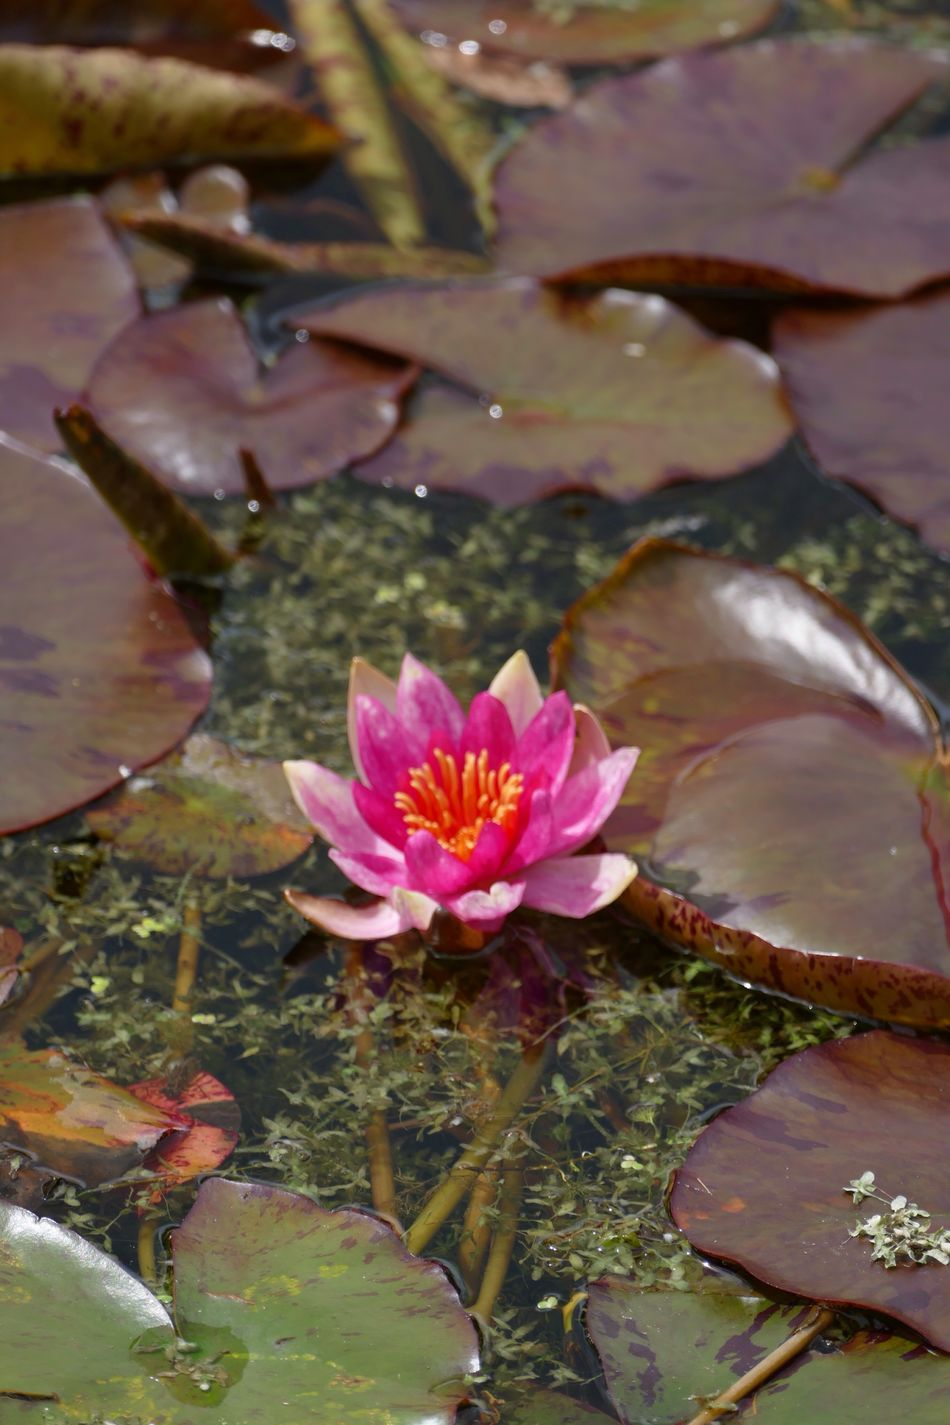 Lily Flower Lily Water Water Lily Water Lillies Water Lilies. Lilly Pads. Water Lily, Flower LUMIX DMC FZ1000 Natures Diversities Nature's Diversities Flowers,Plants & Garden Flower Collection Red Flower Red Flowers